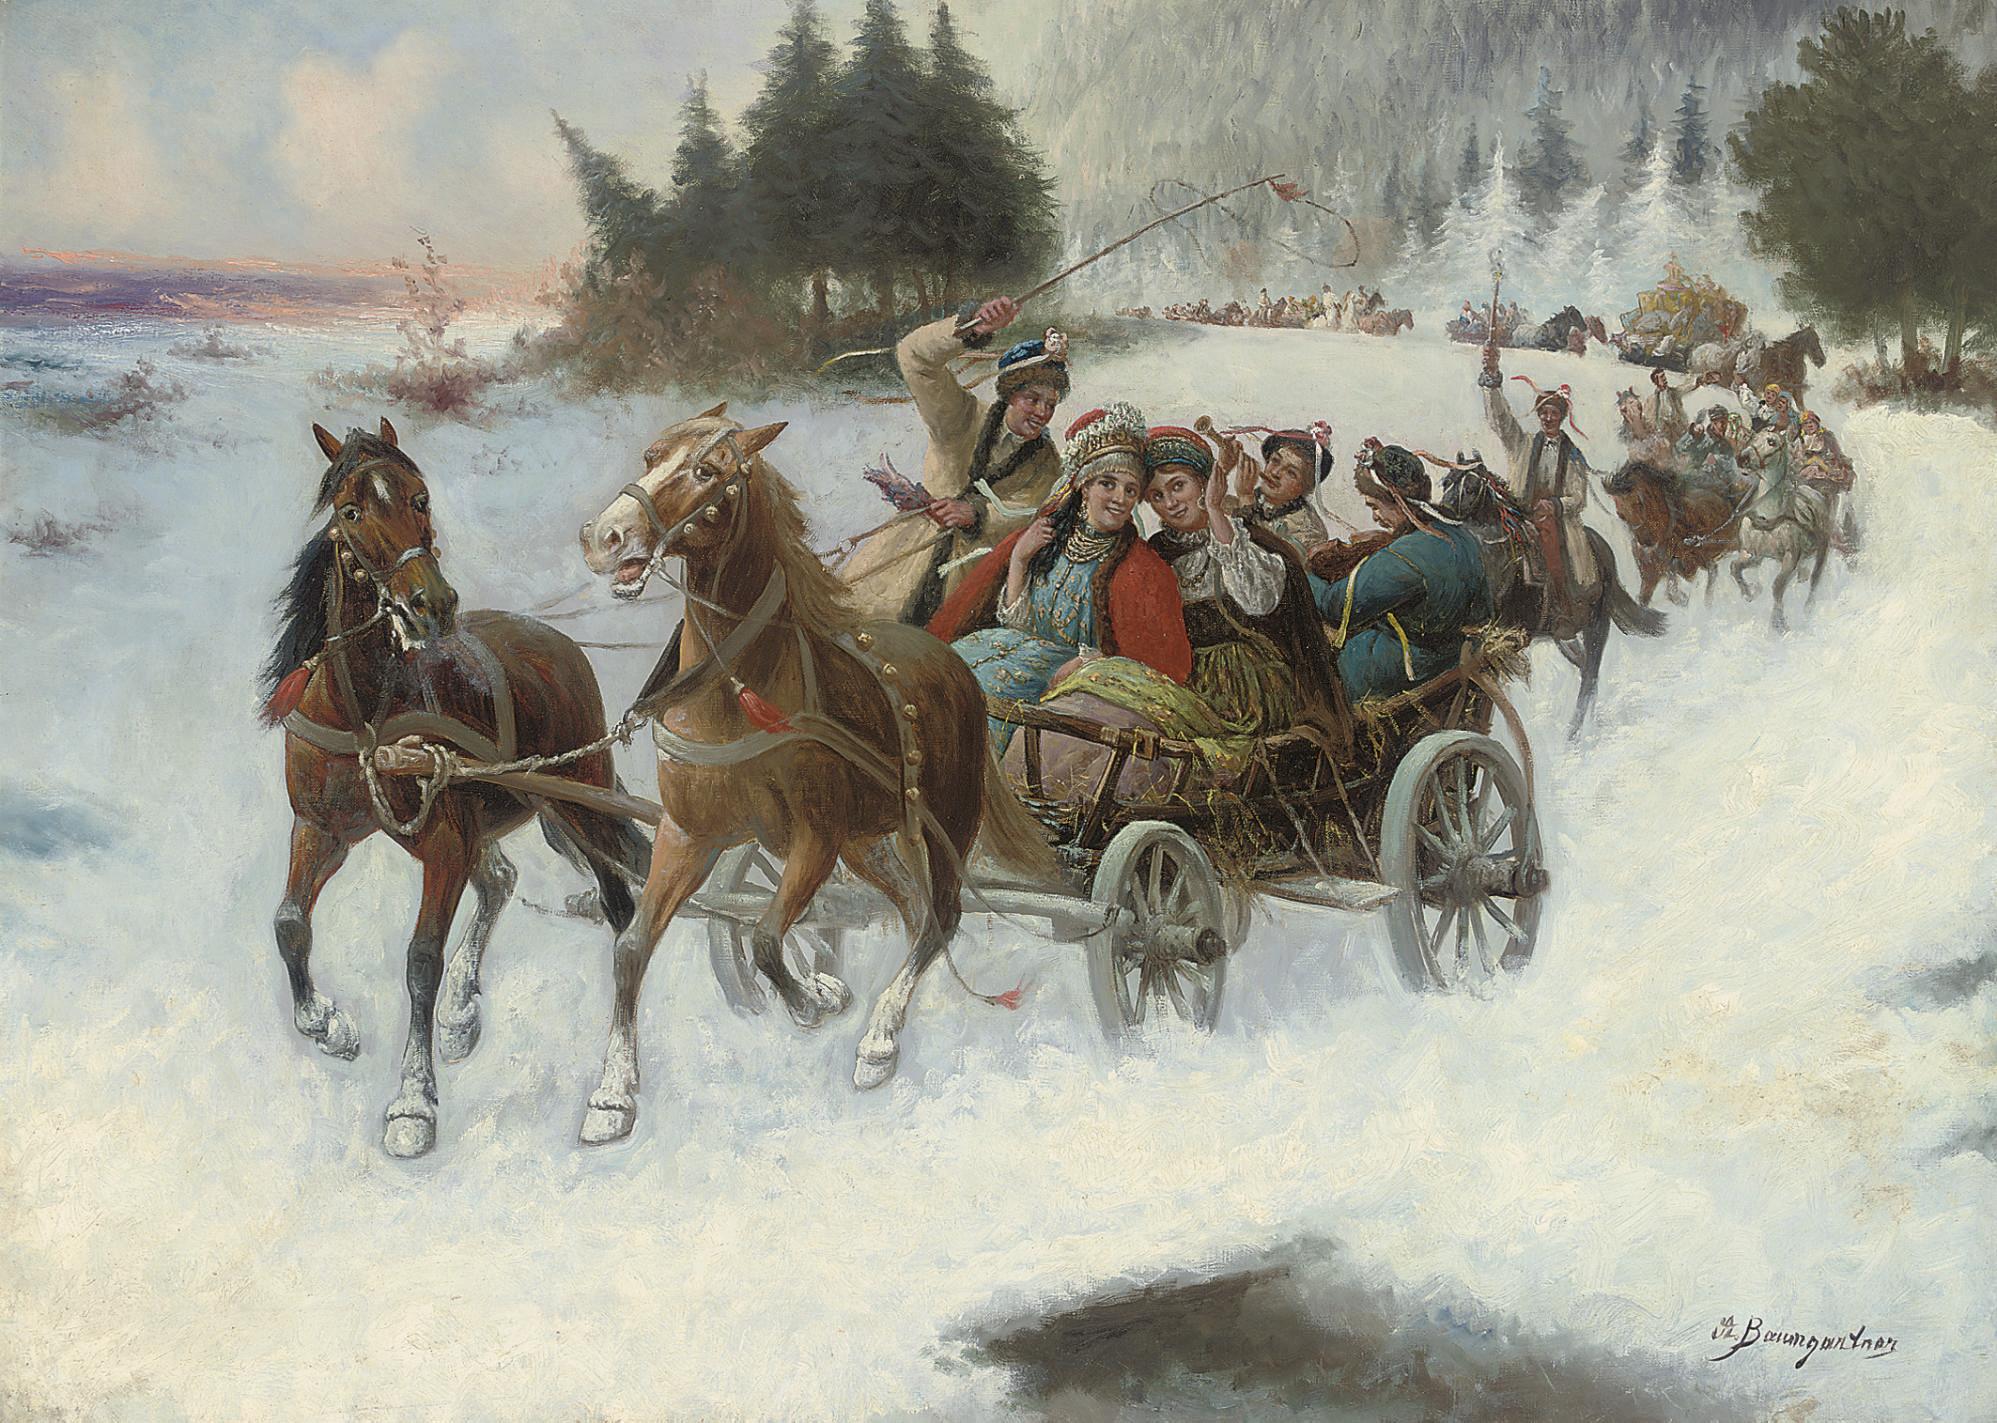 A happy sleigh-ride